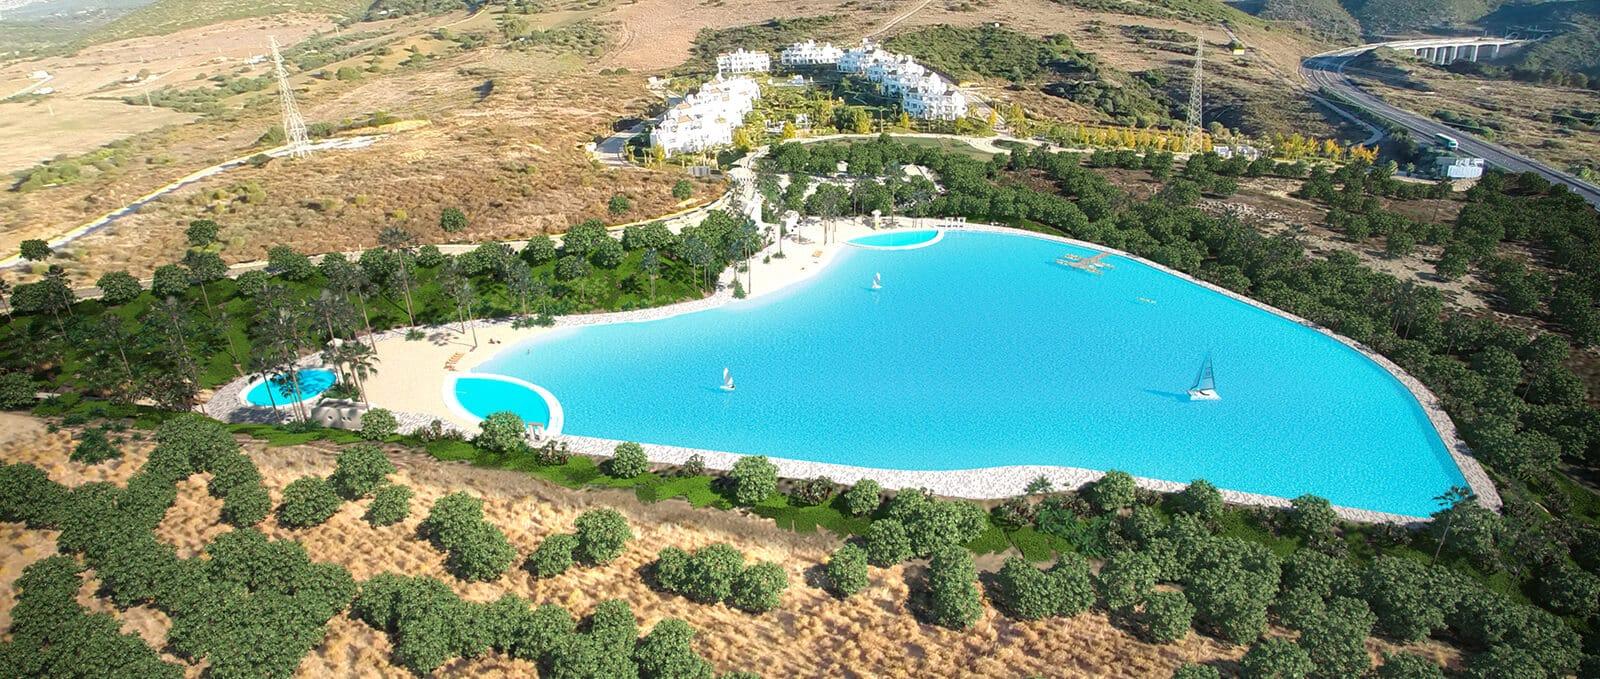 La Alcazaba Hills Lagoons resort by Crystal Lagoons